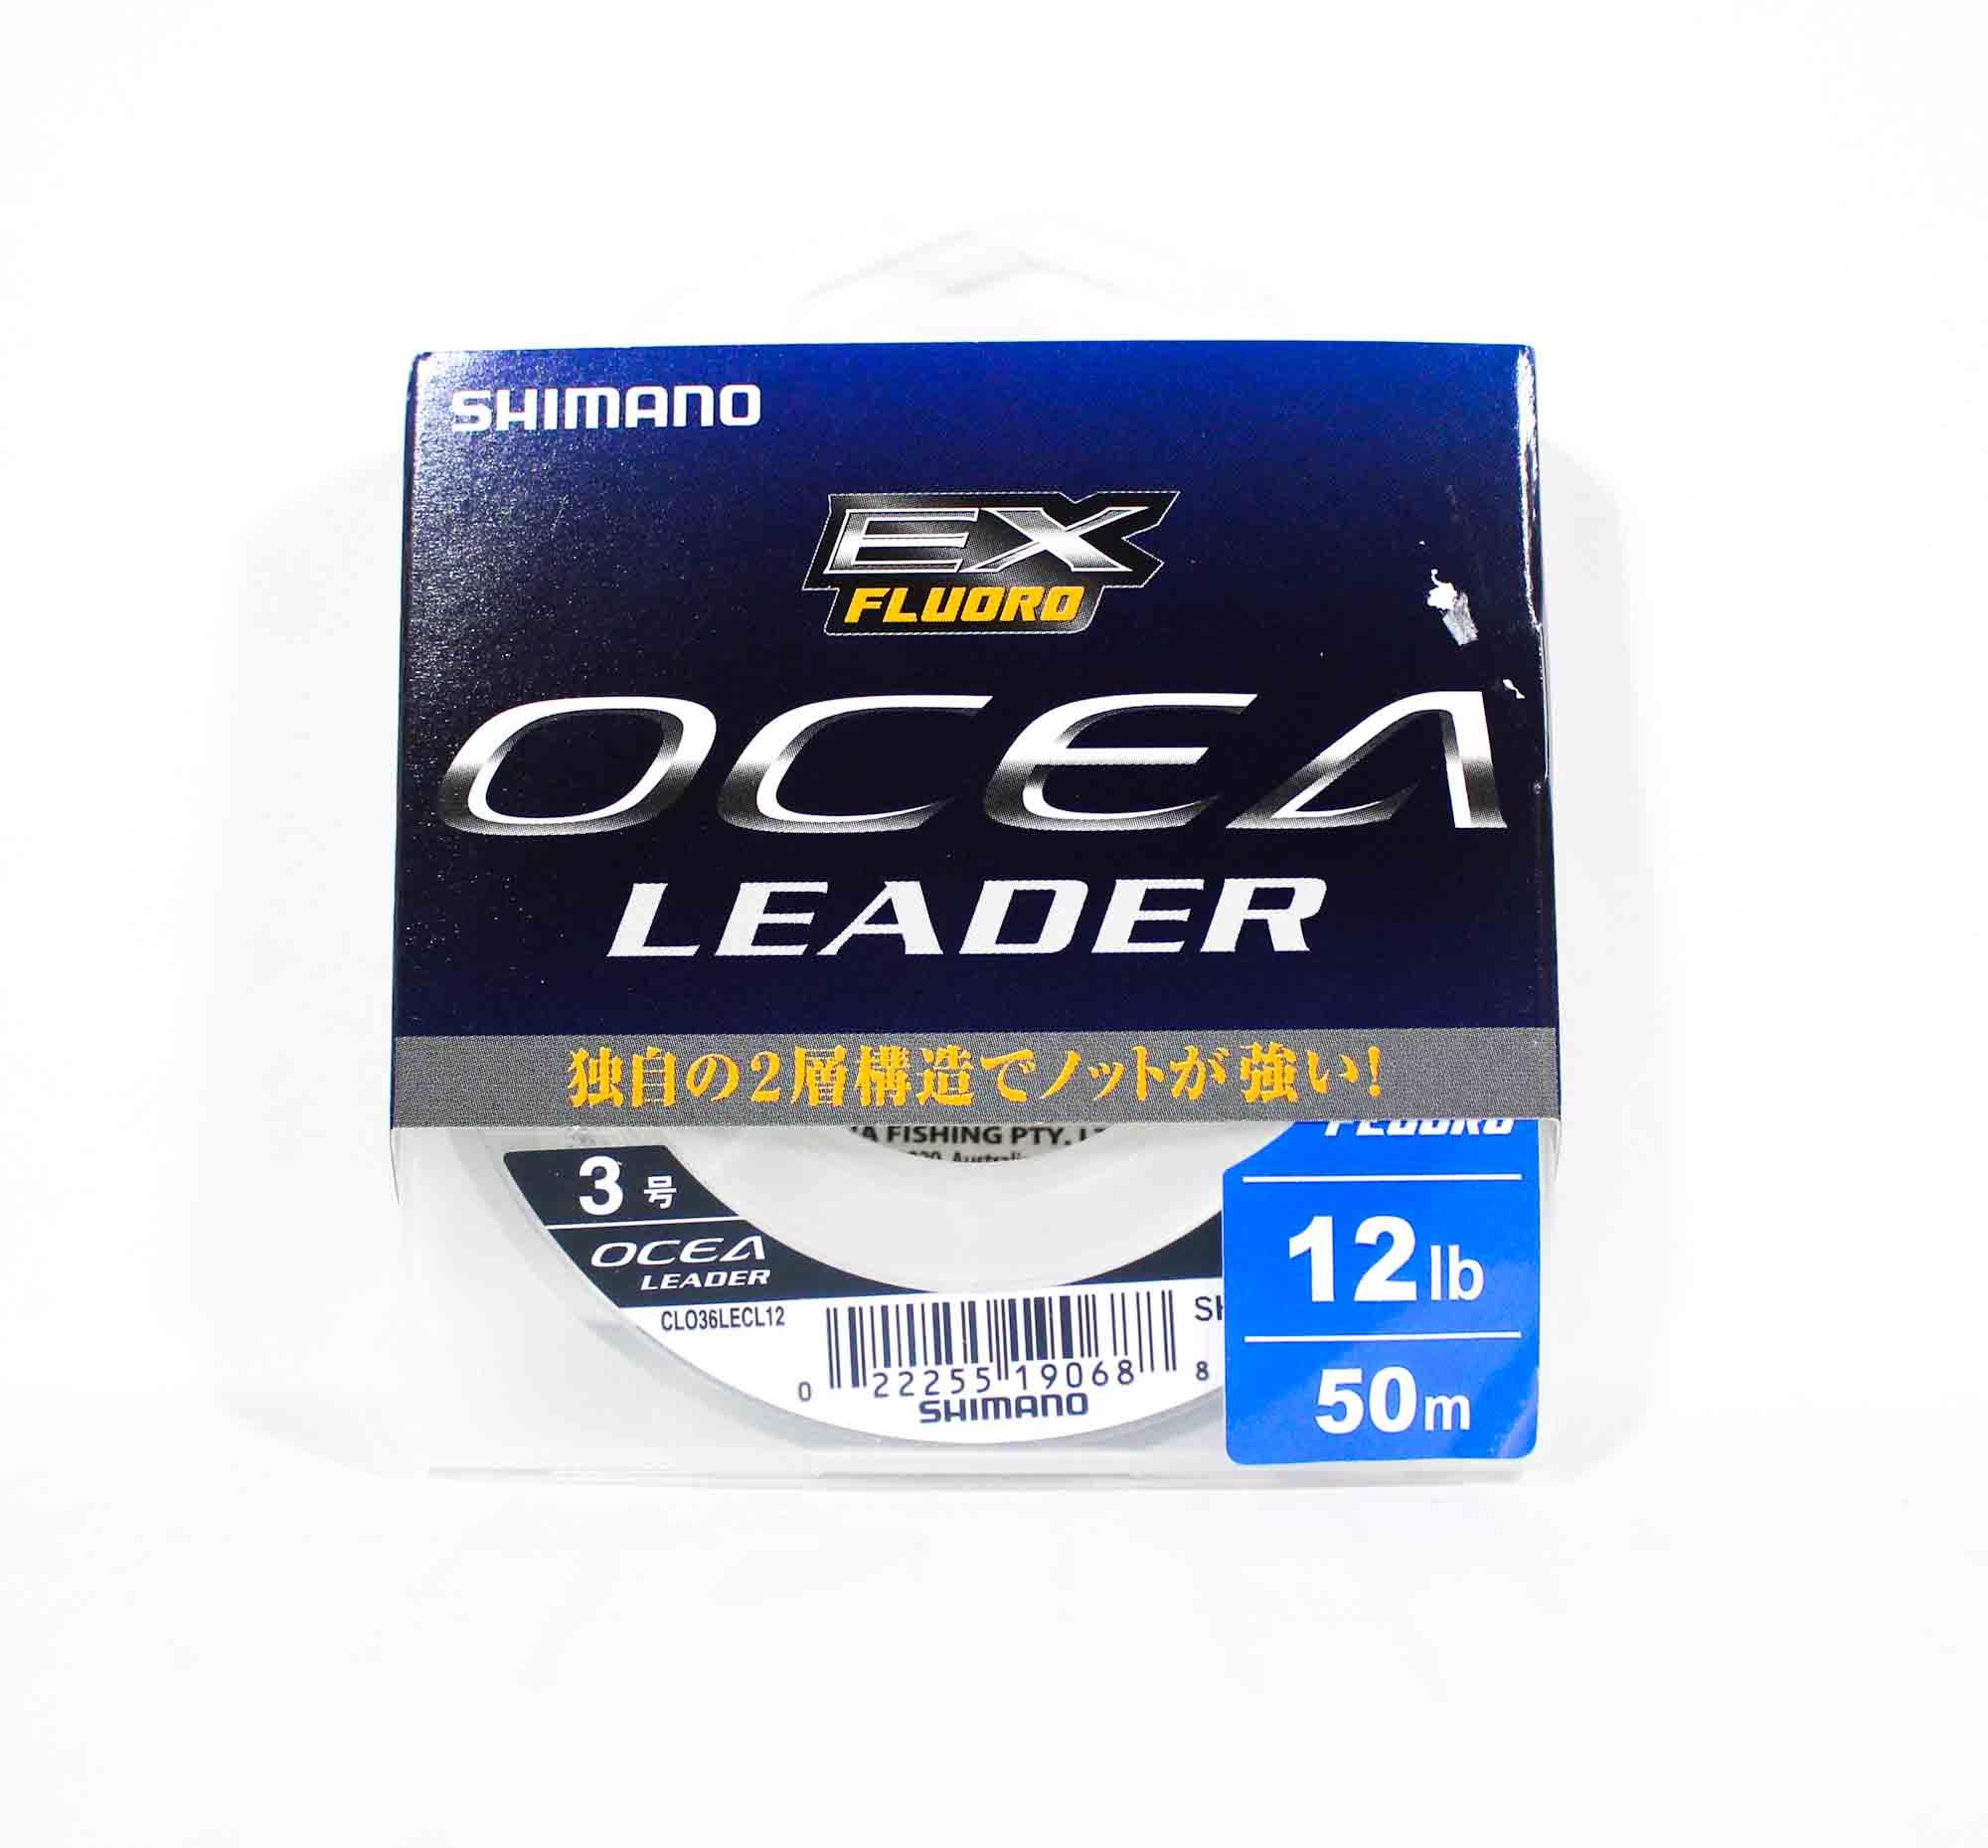 Shimano CL-036L Ocea EX Fluorocarbon Leader Line 50m 12lb (0688)